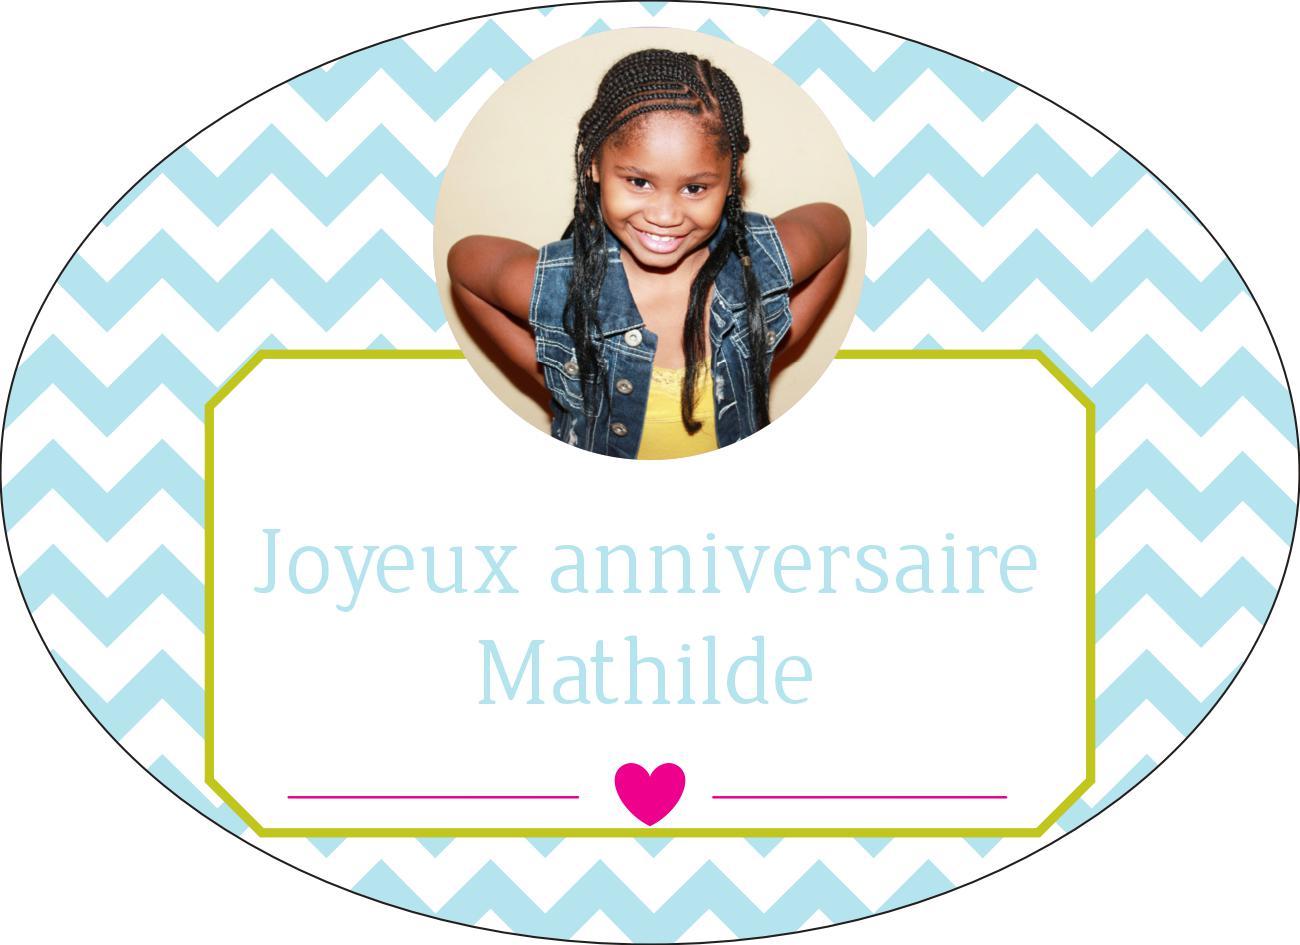 birthday-children-mathilde_has-image